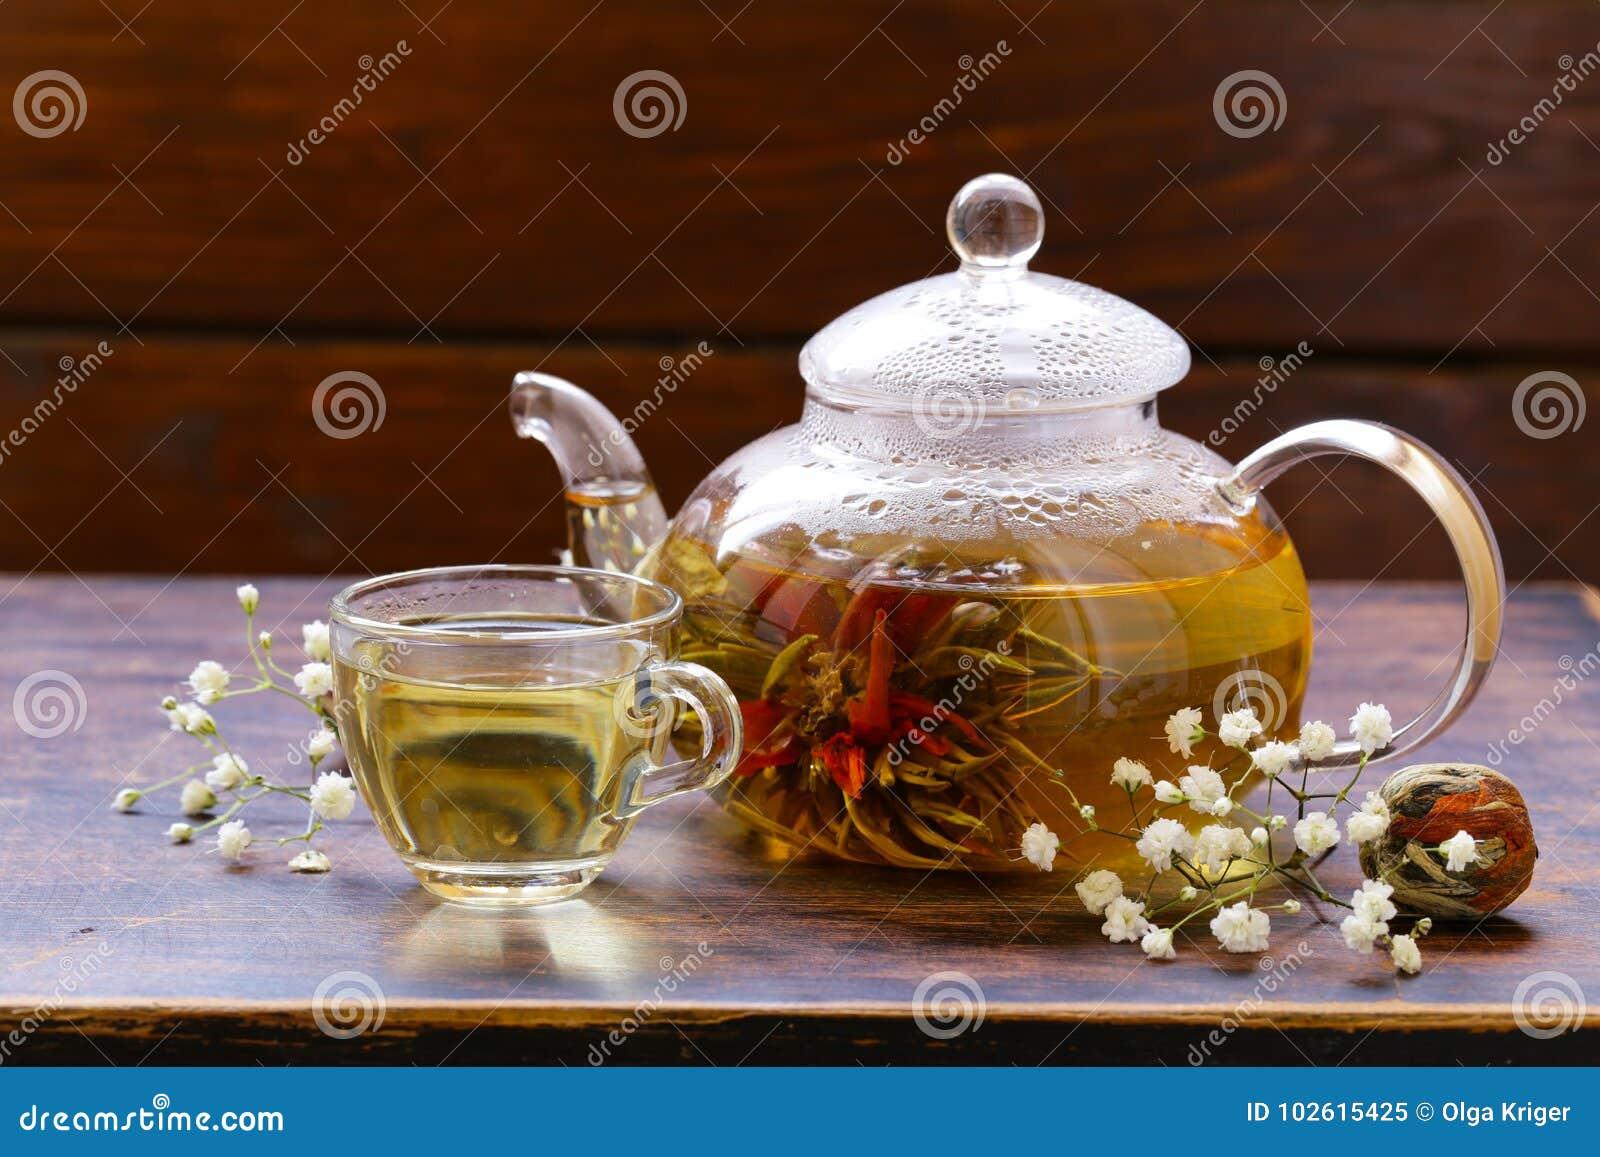 Green Tea Flower Celestial Lily Stock Image Image Of Glass White